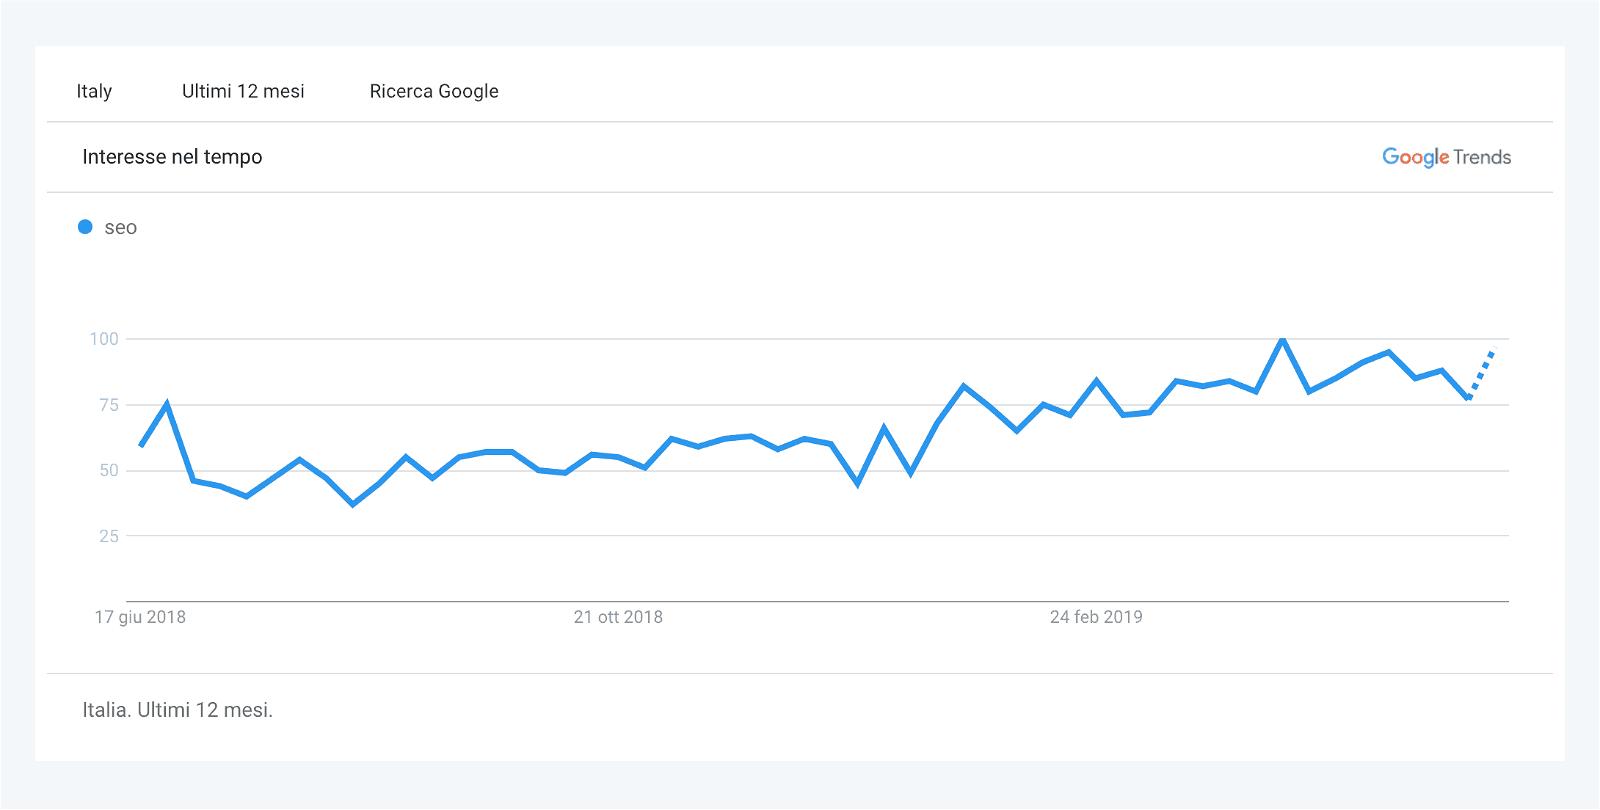 Google Trends Keyword Explorer